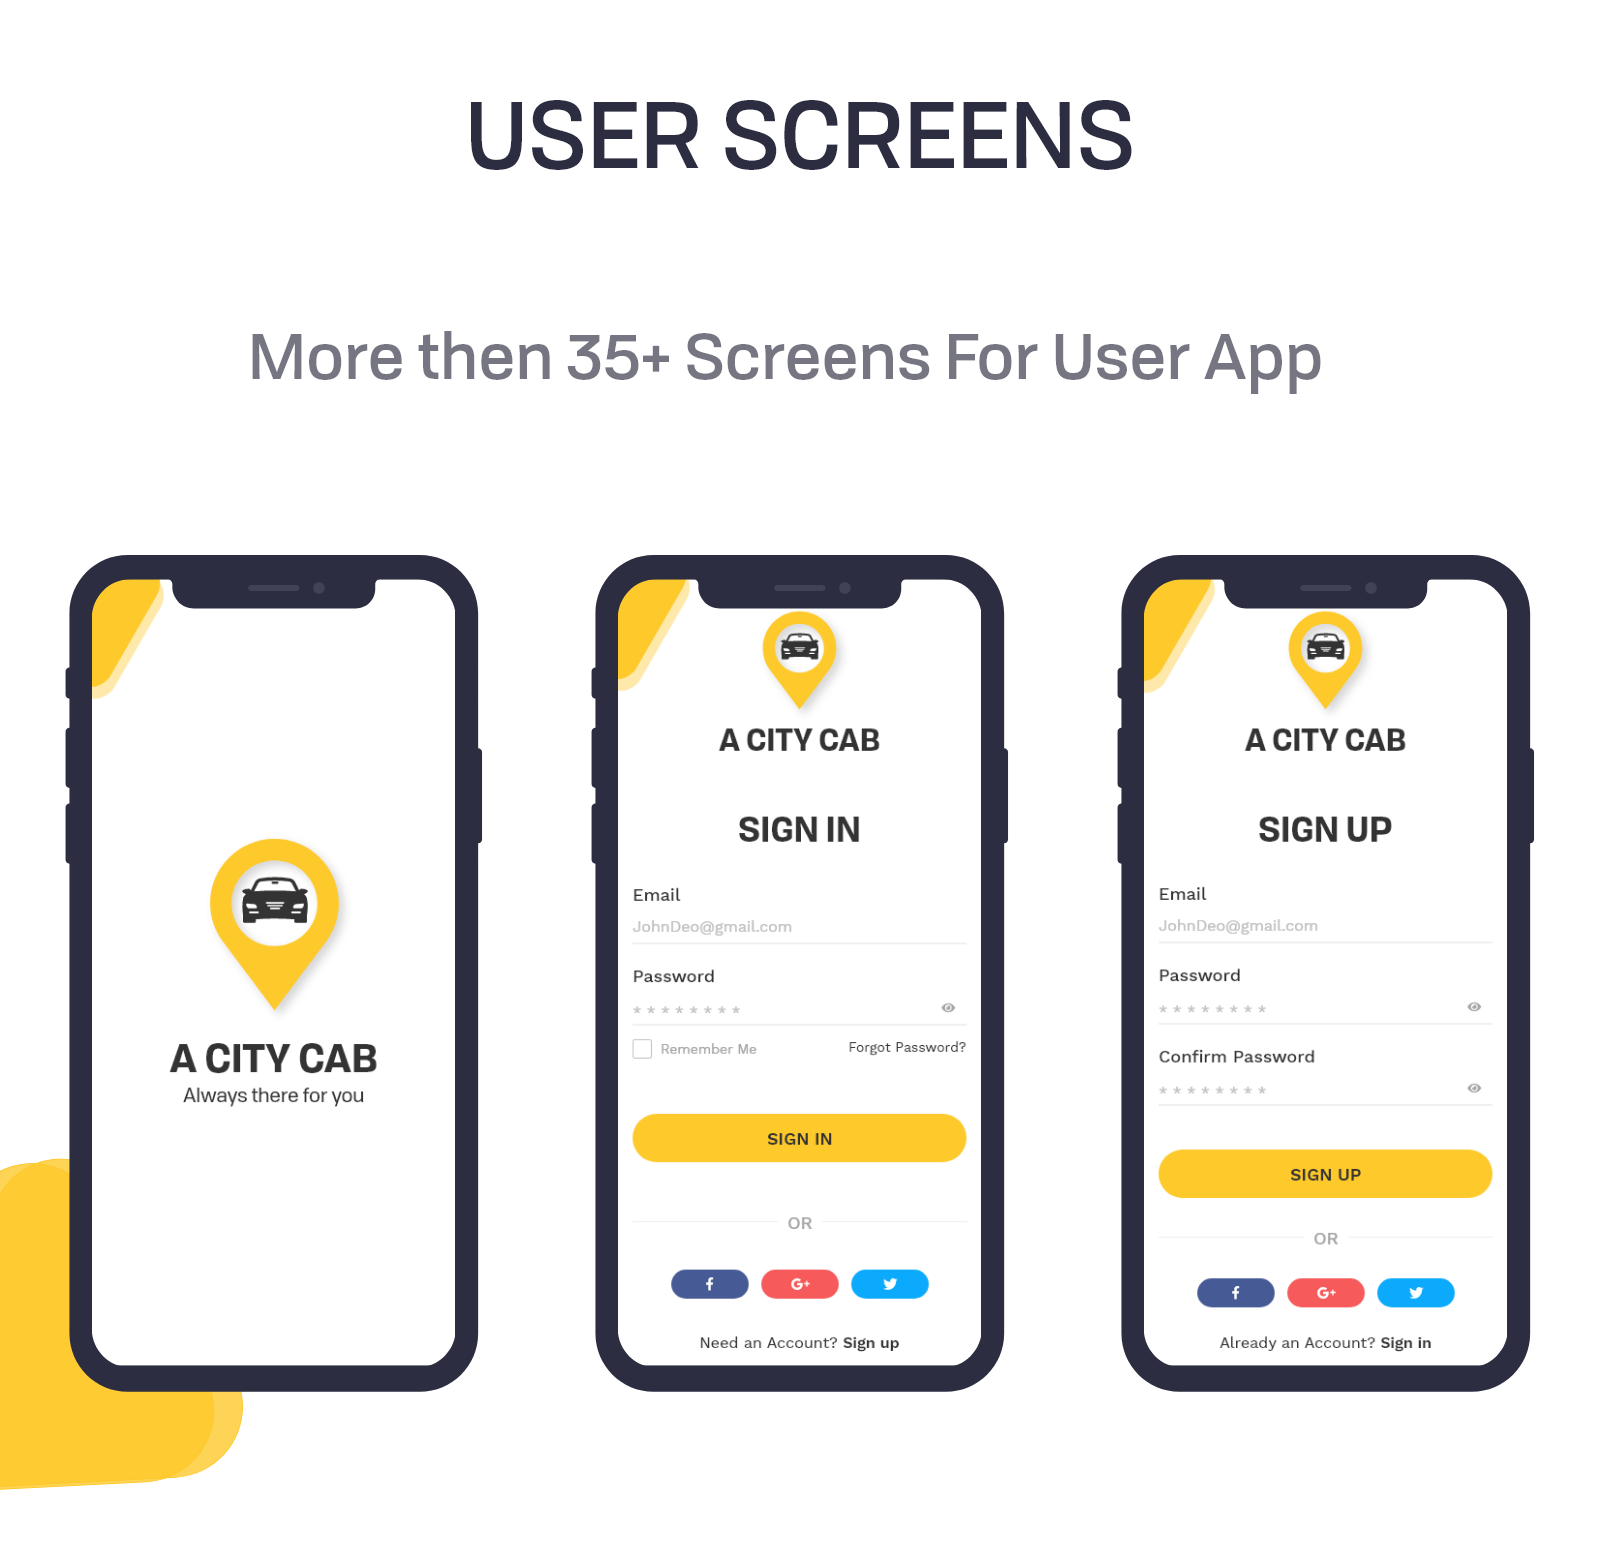 Citycab-ola-uber-taxi-booking-app-1